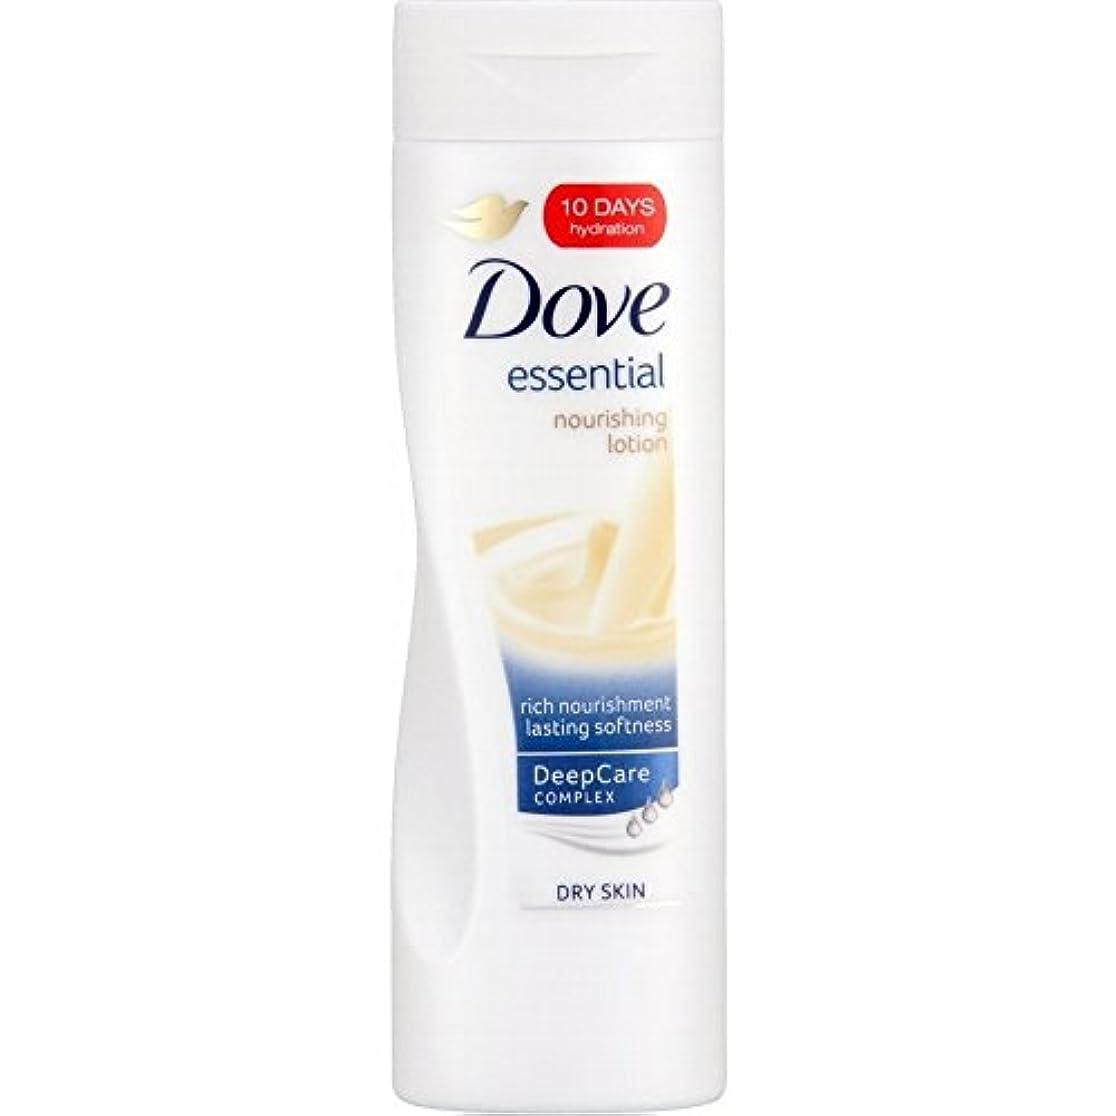 Dove Essential Nourishment Body Lotion - Dry Skin (250ml) 鳩不可欠な栄養ボディローション - 乾燥肌( 250ミリリットル) [並行輸入品]